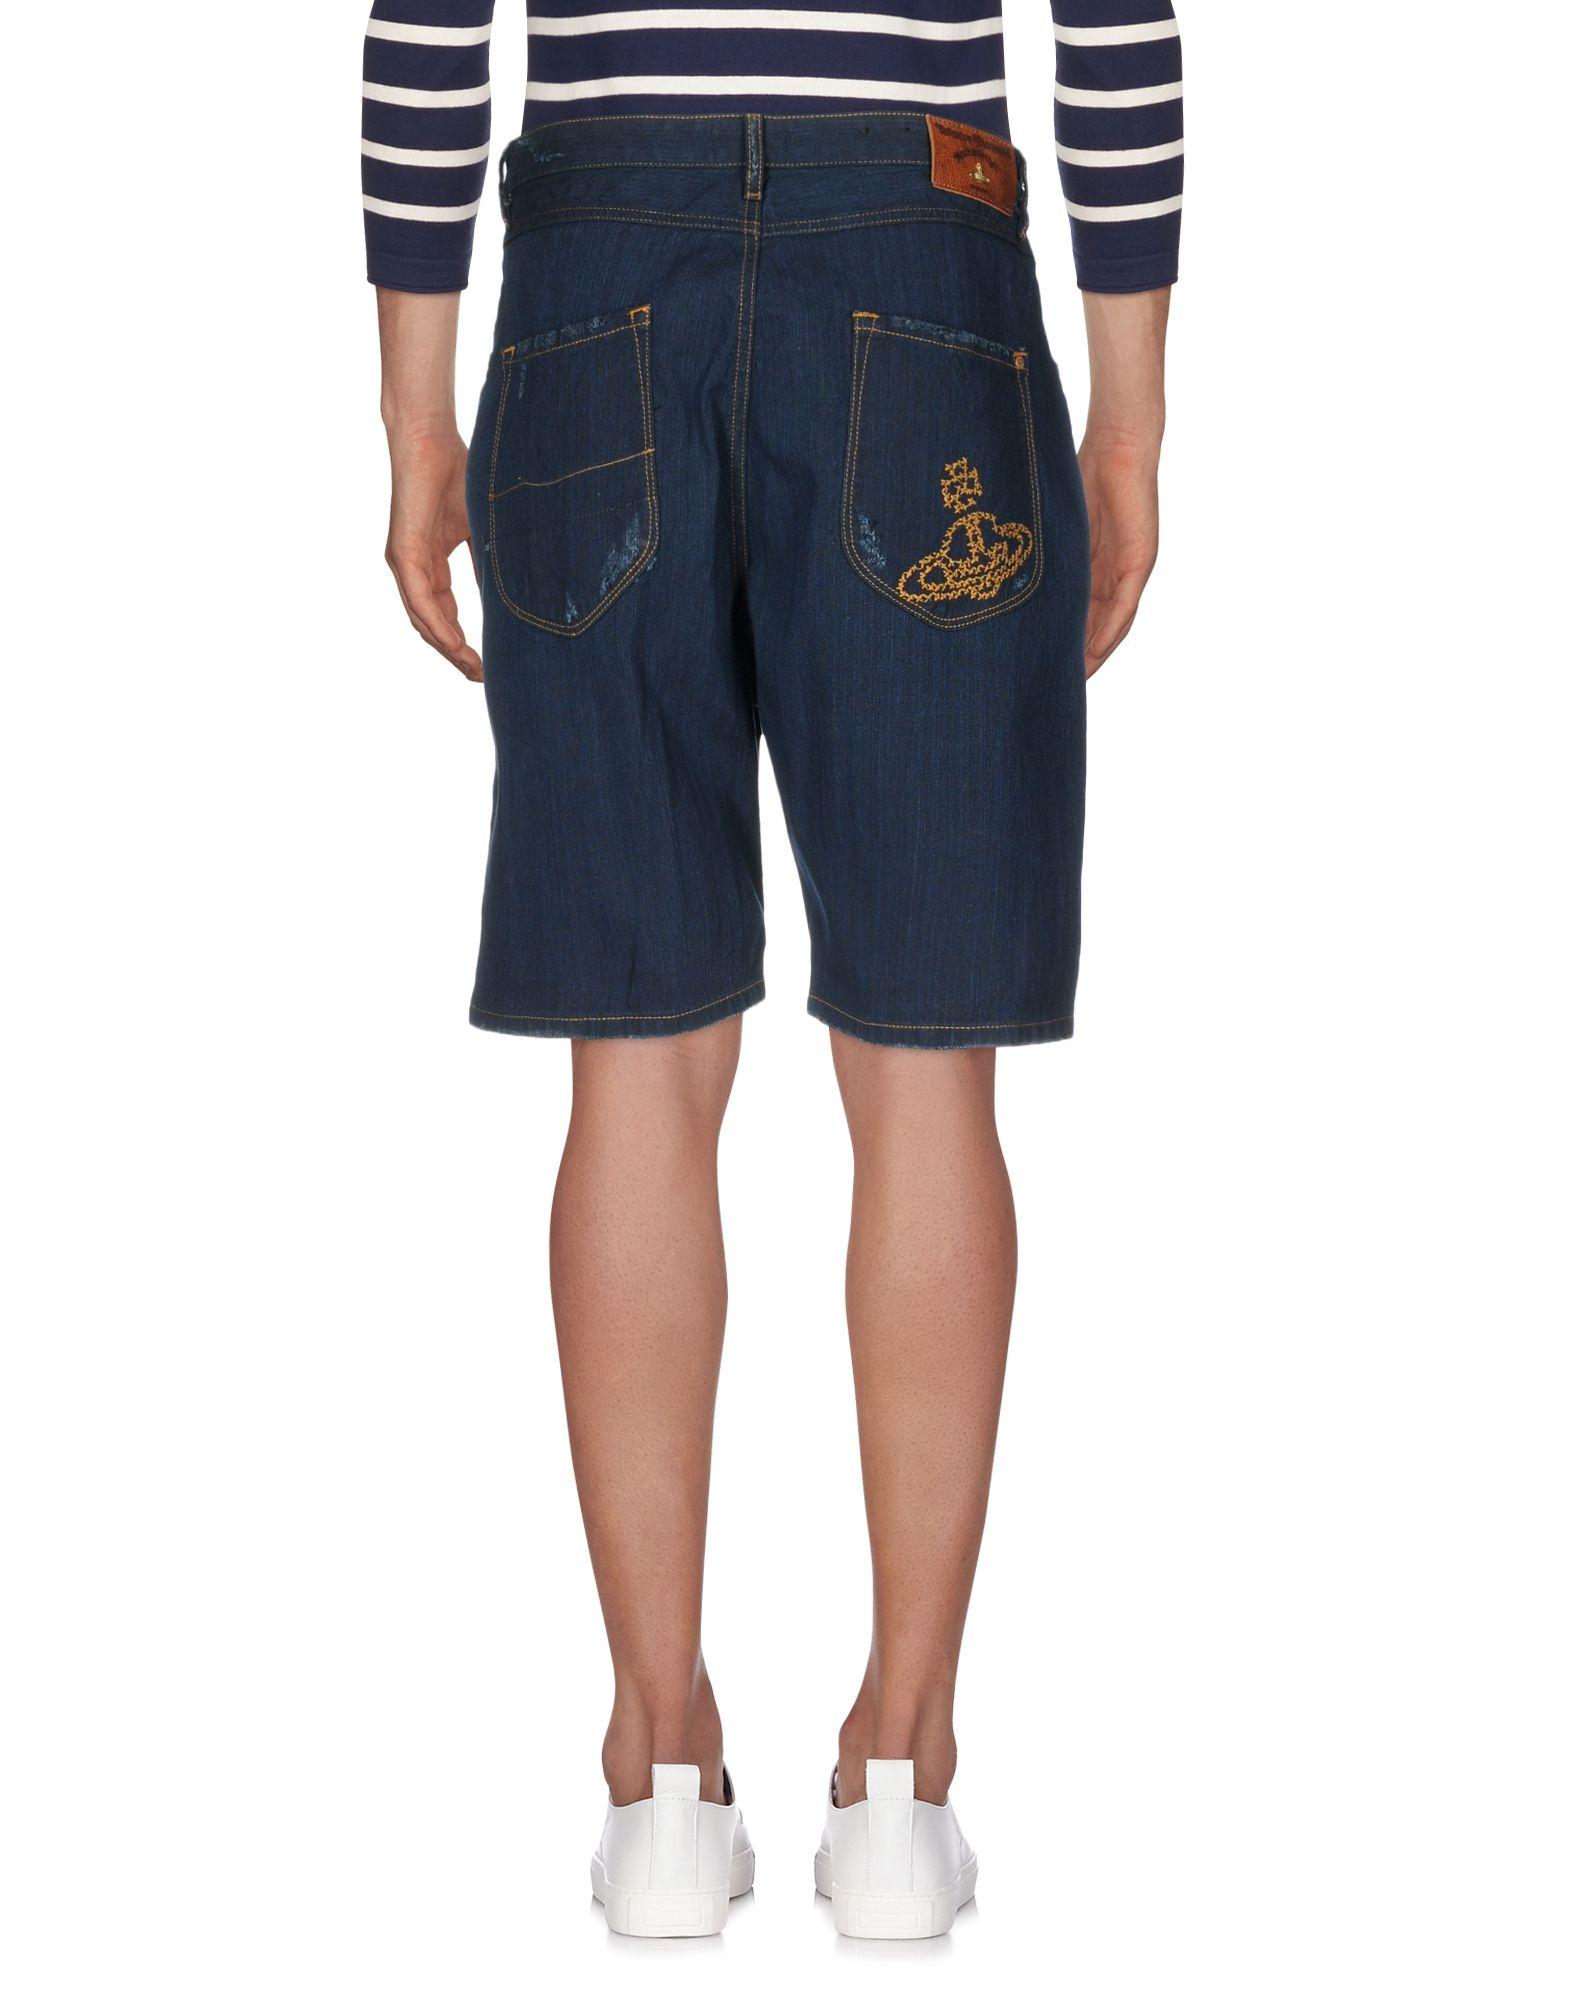 Shorts Jeans Vivienne Westwood Anglomania Anglomania Anglomania Uomo - 42653761QF 2c308f